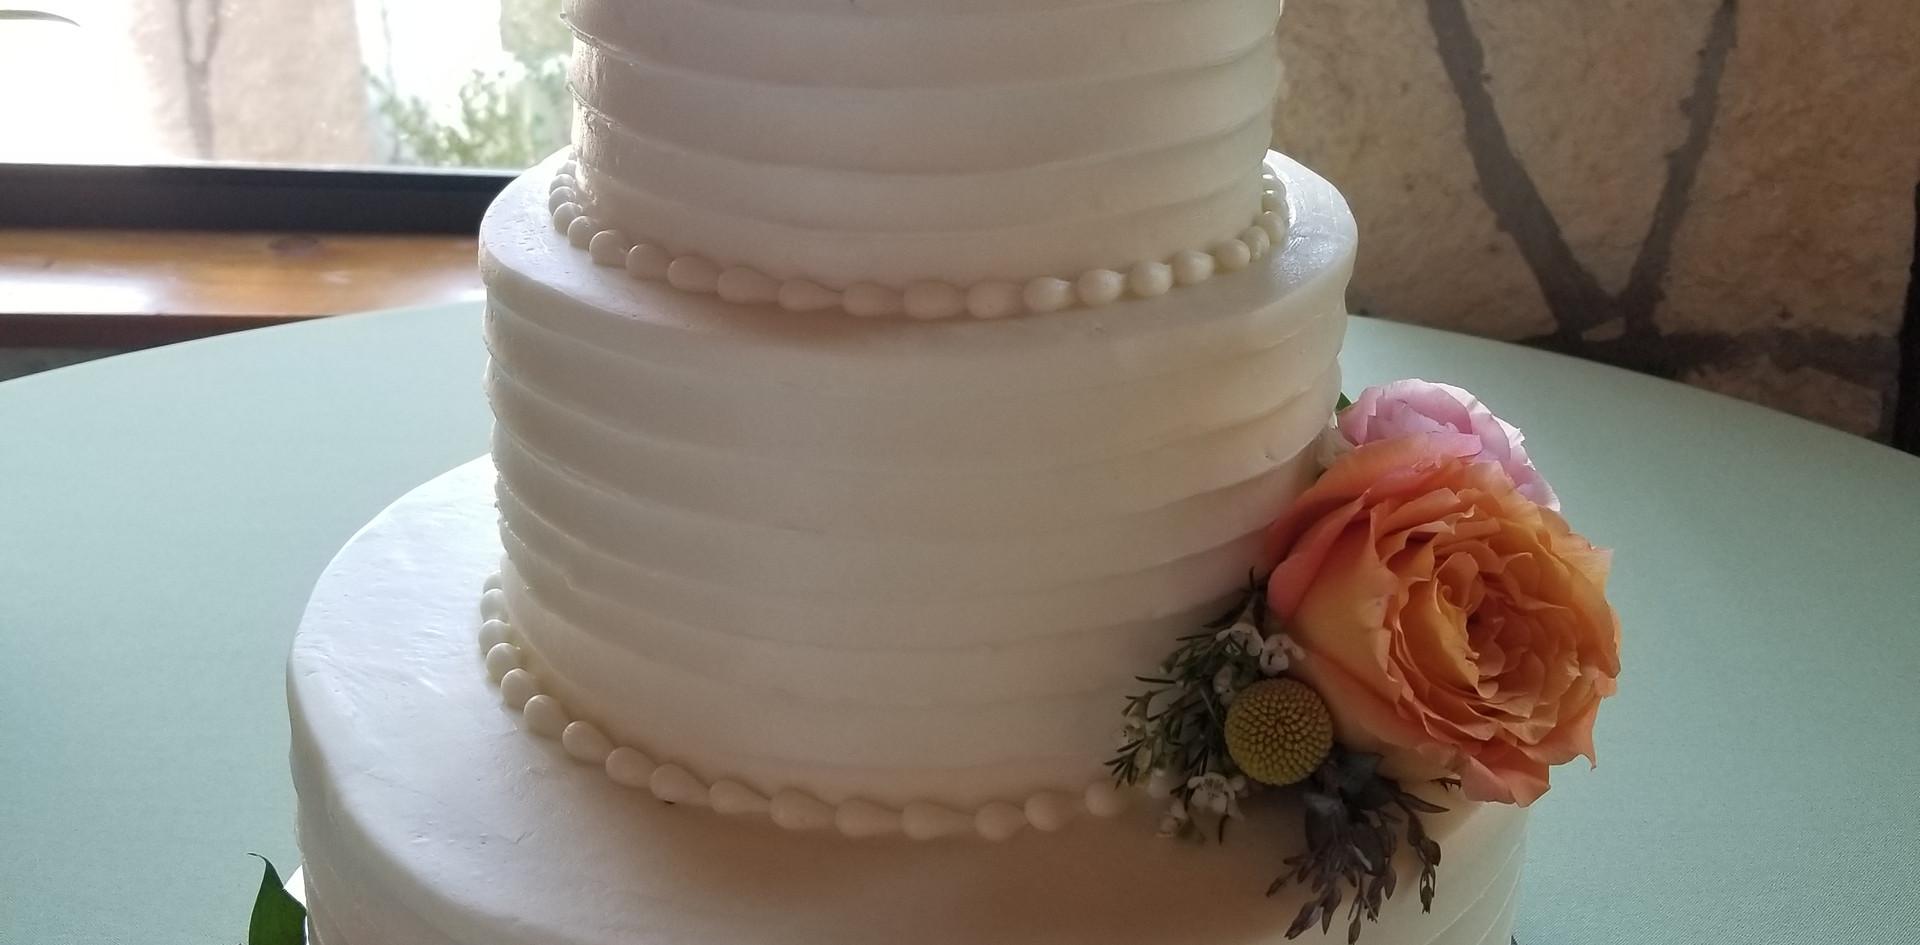 Palette knife wedding cake